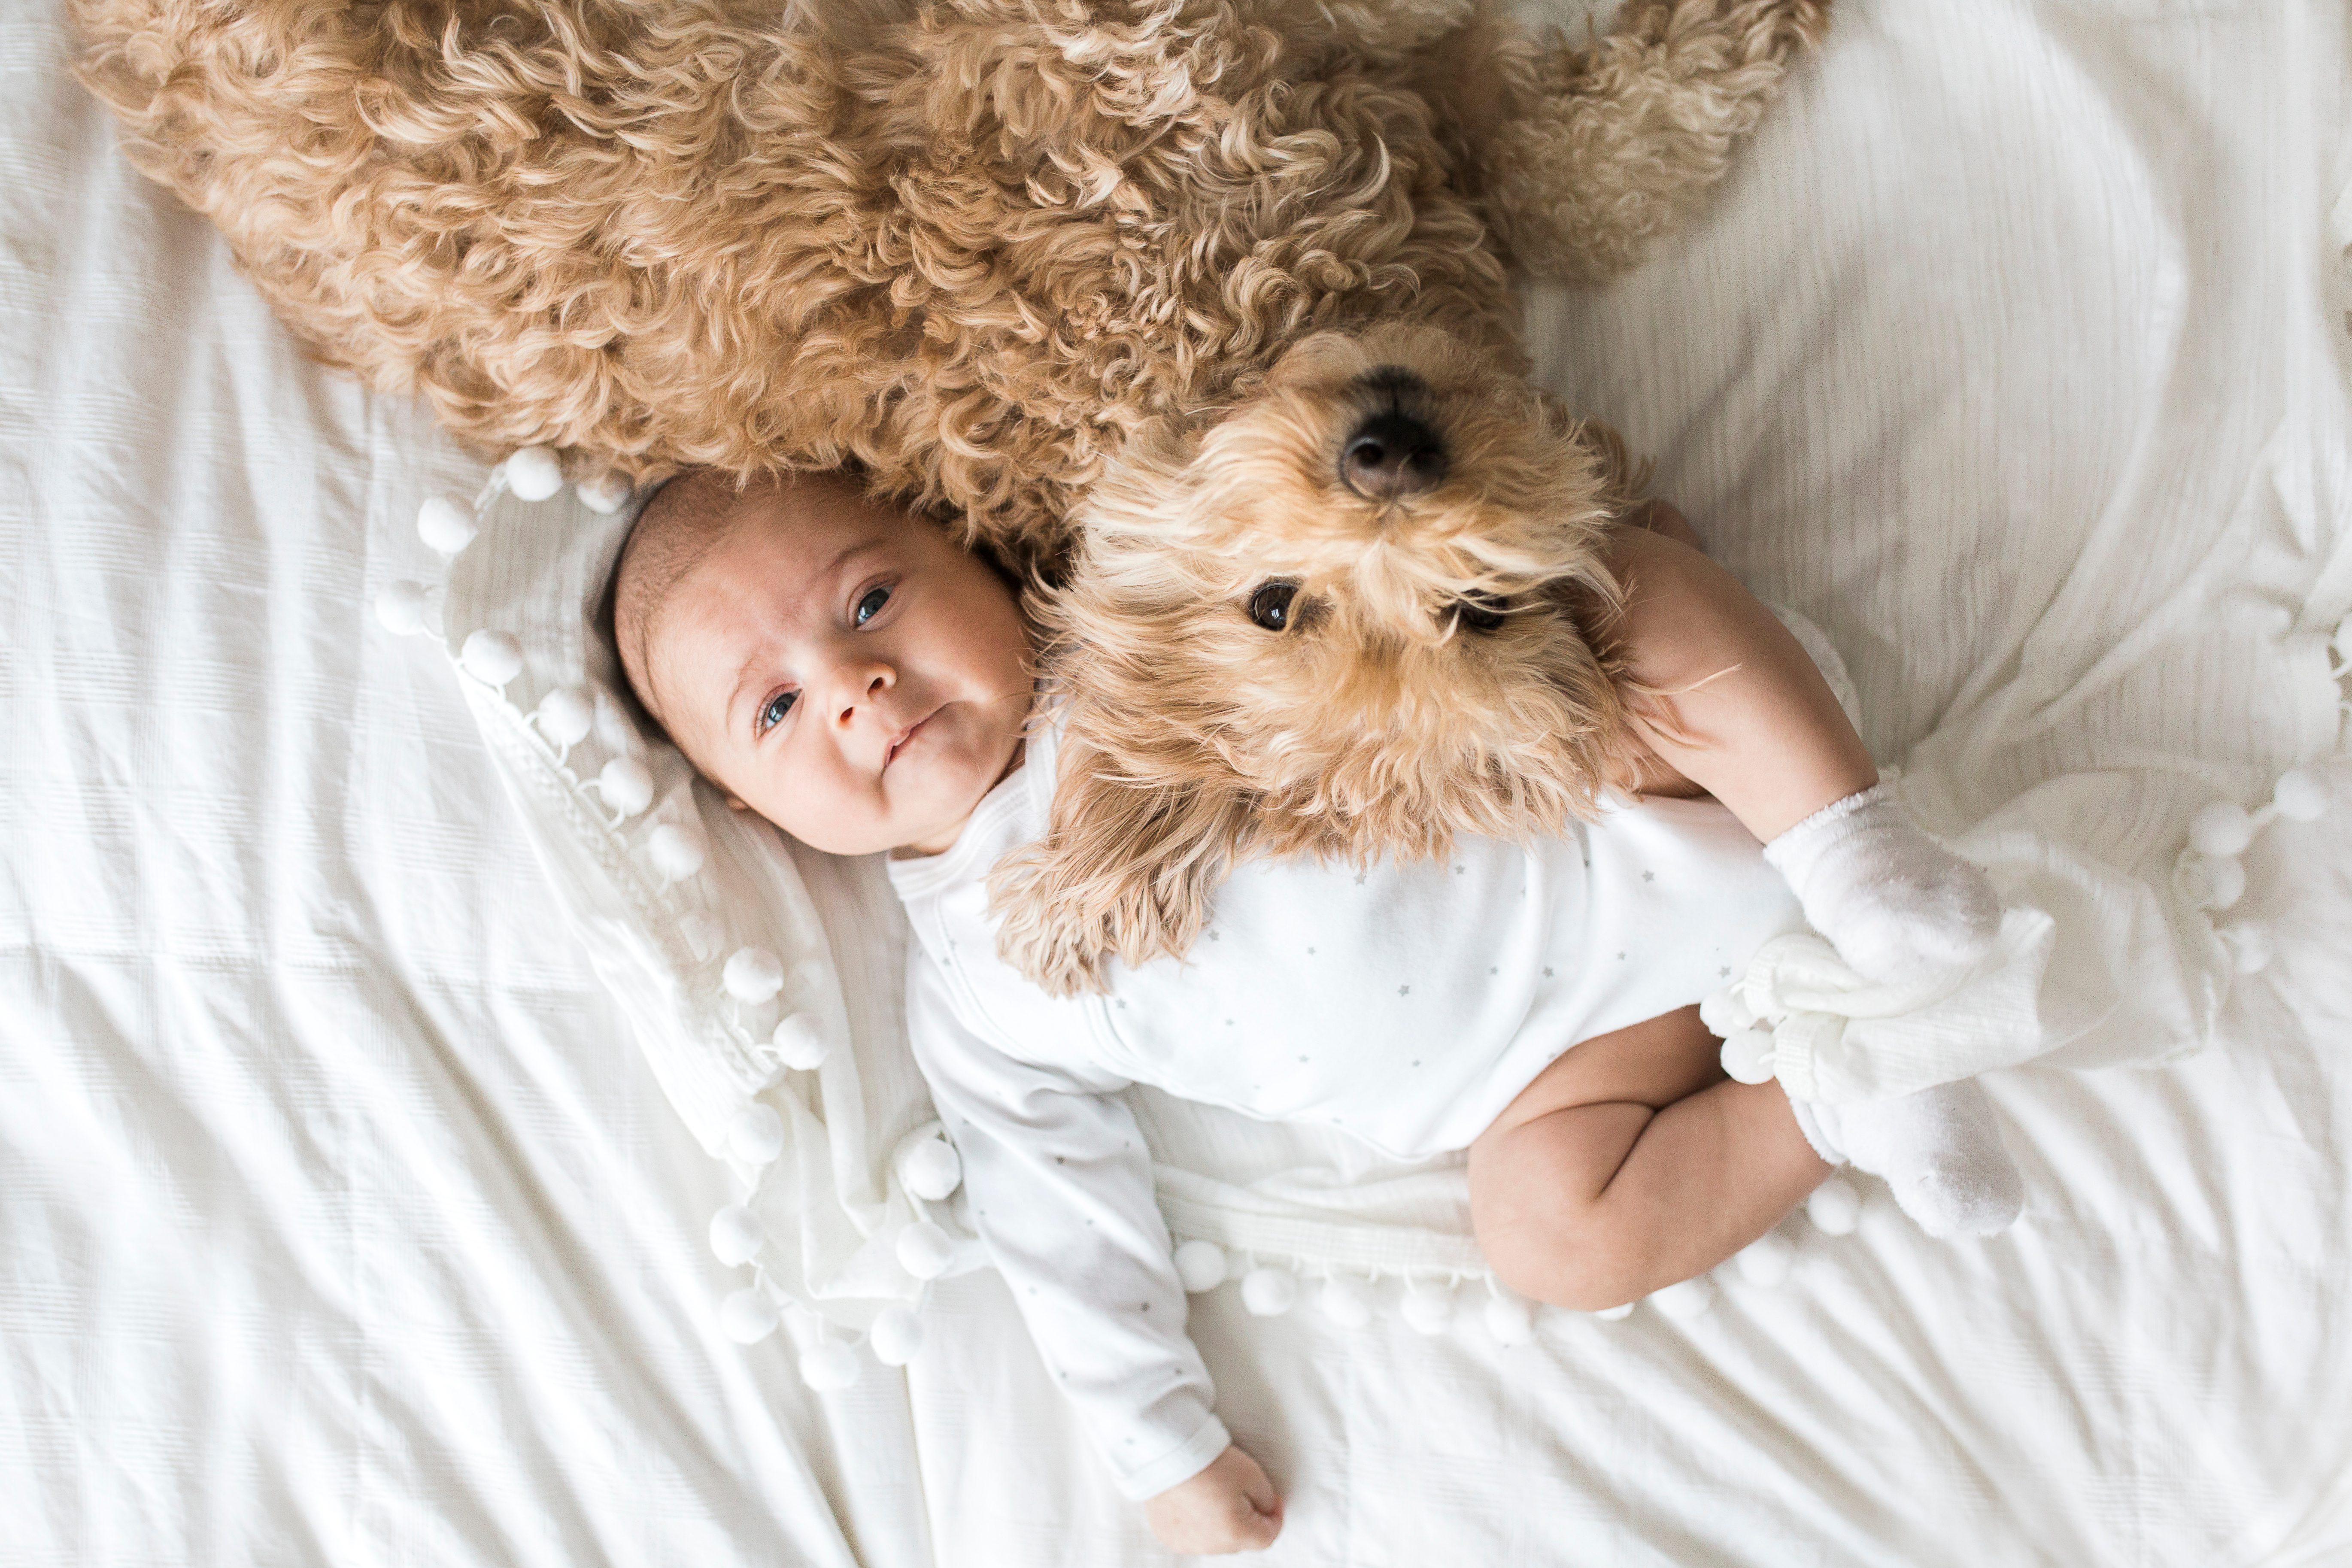 Baby Laying Next to Dog